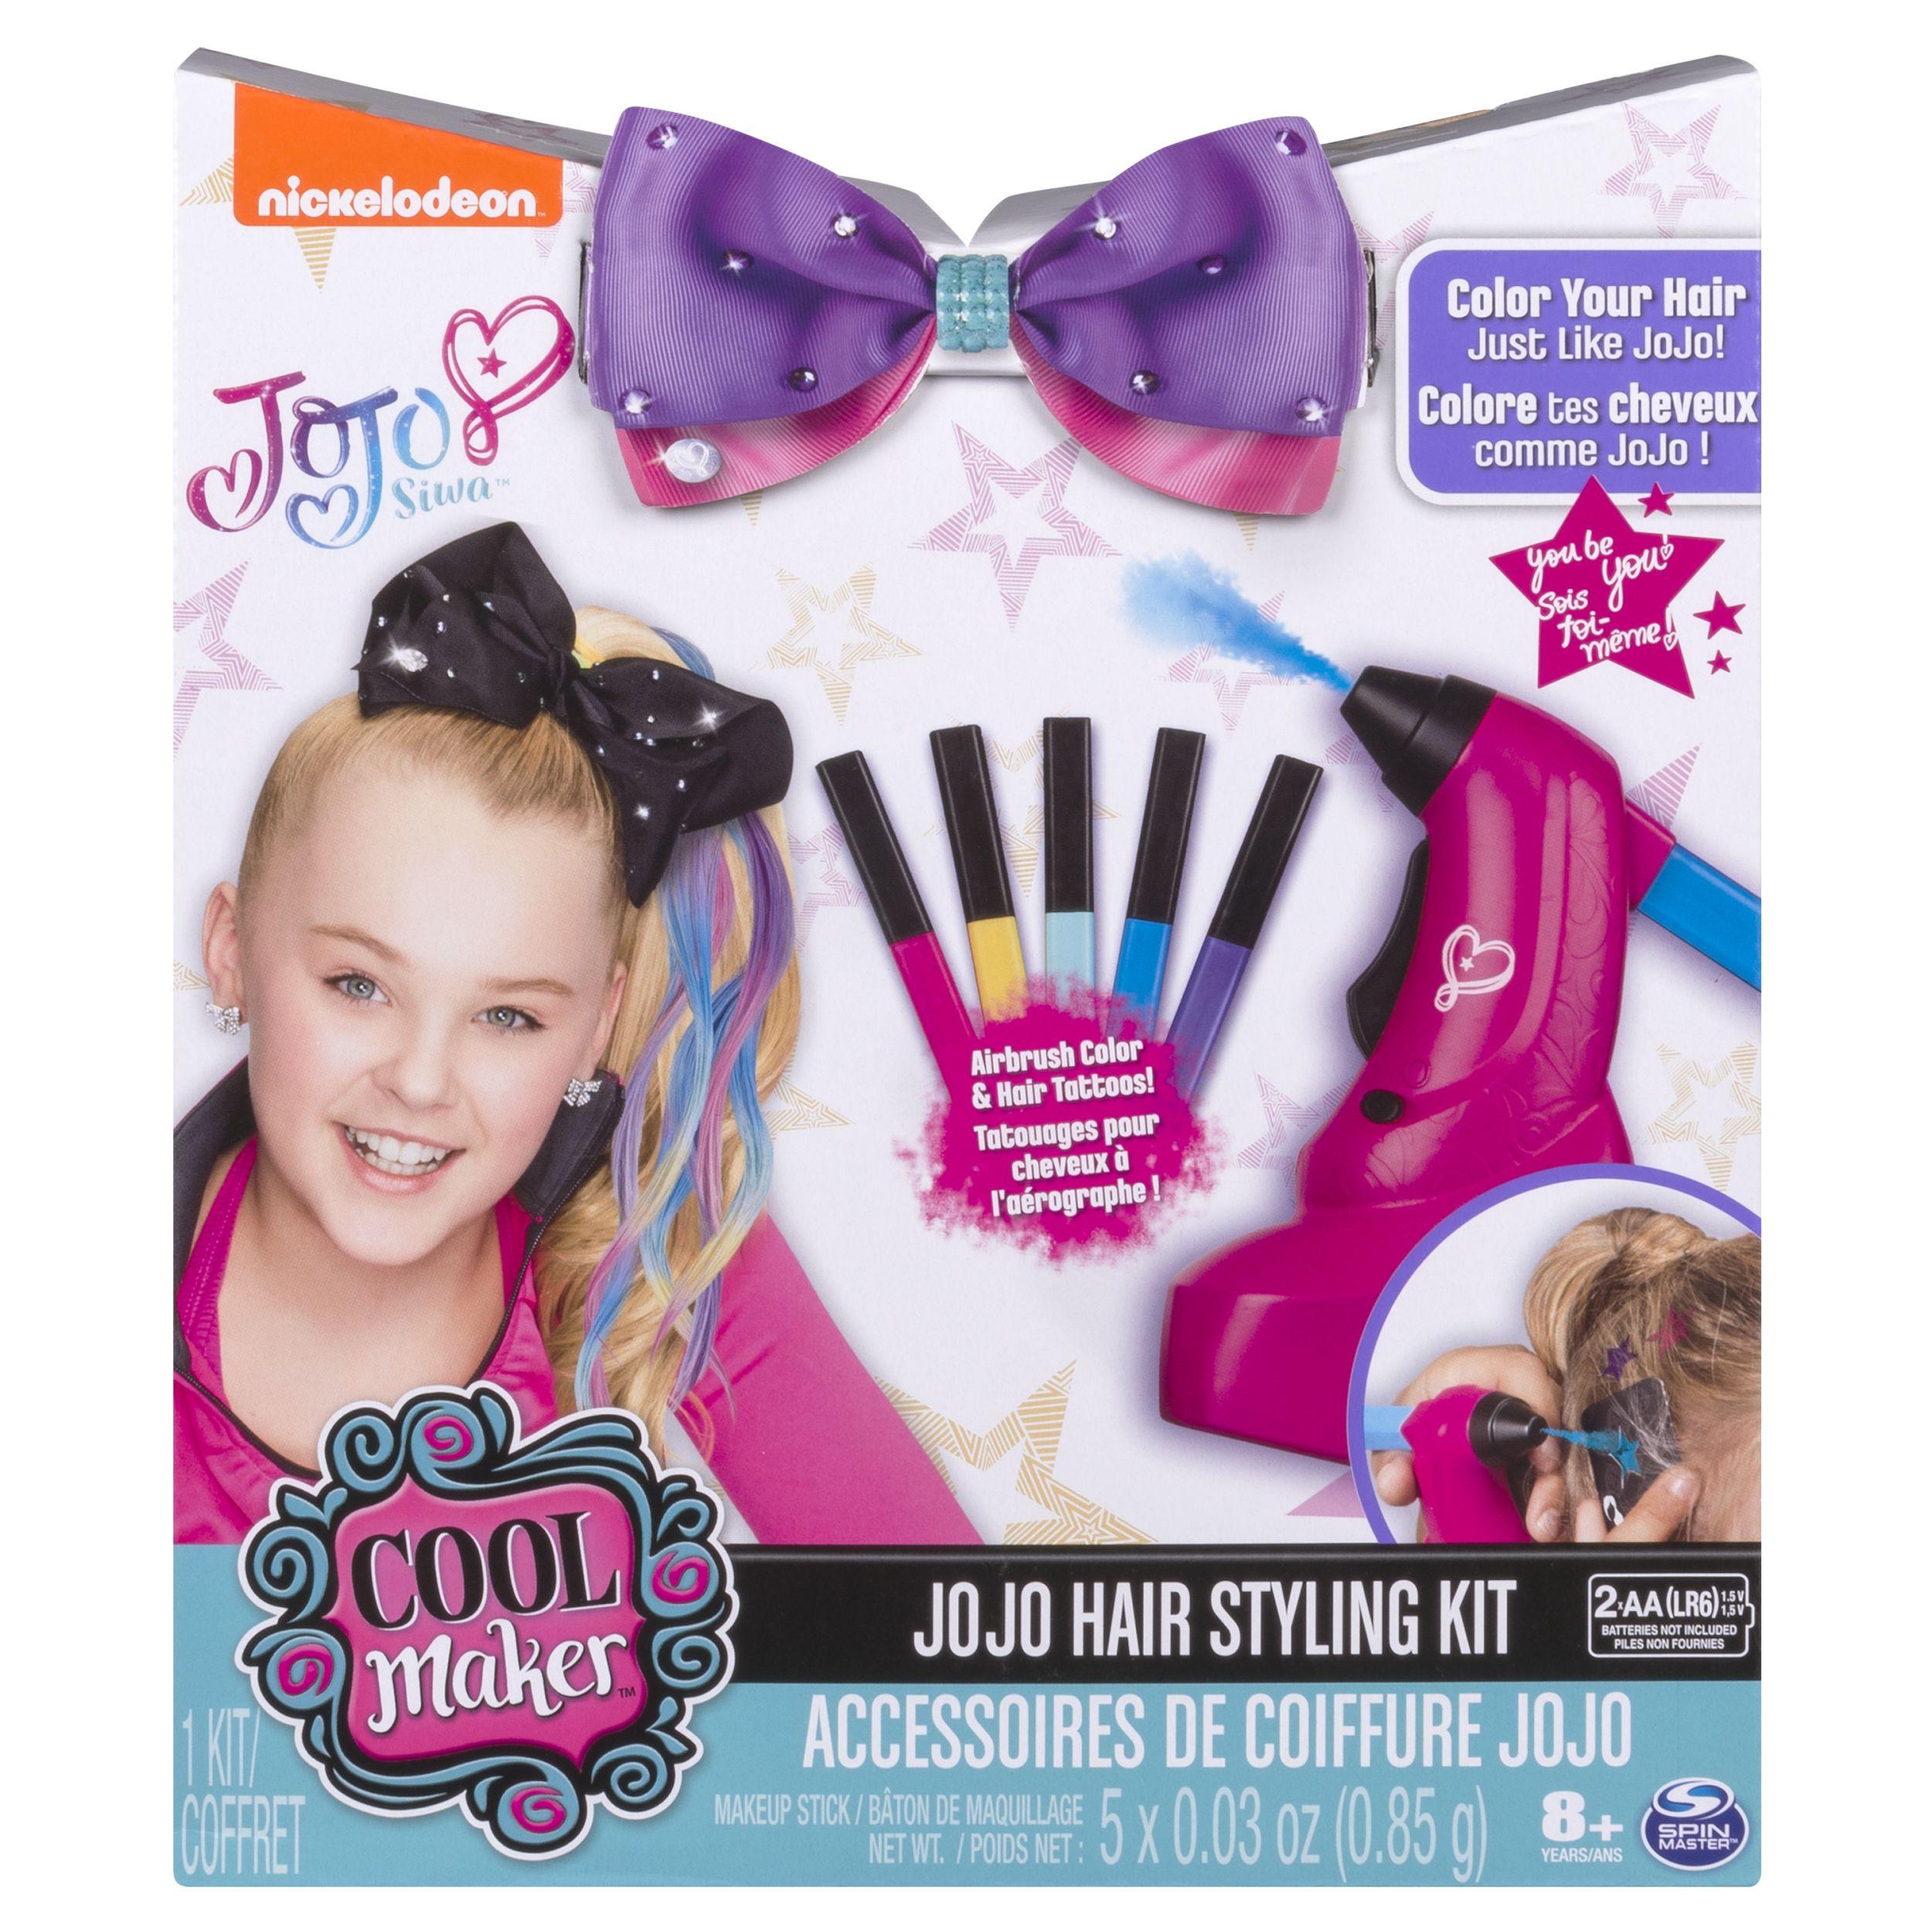 Jojo Siwa Hair Styling Kit Airbrush Highlights And Hair Tattoos Jojo Siwa Hair Jojo Siwa Outfits Jojo Siwa Bows